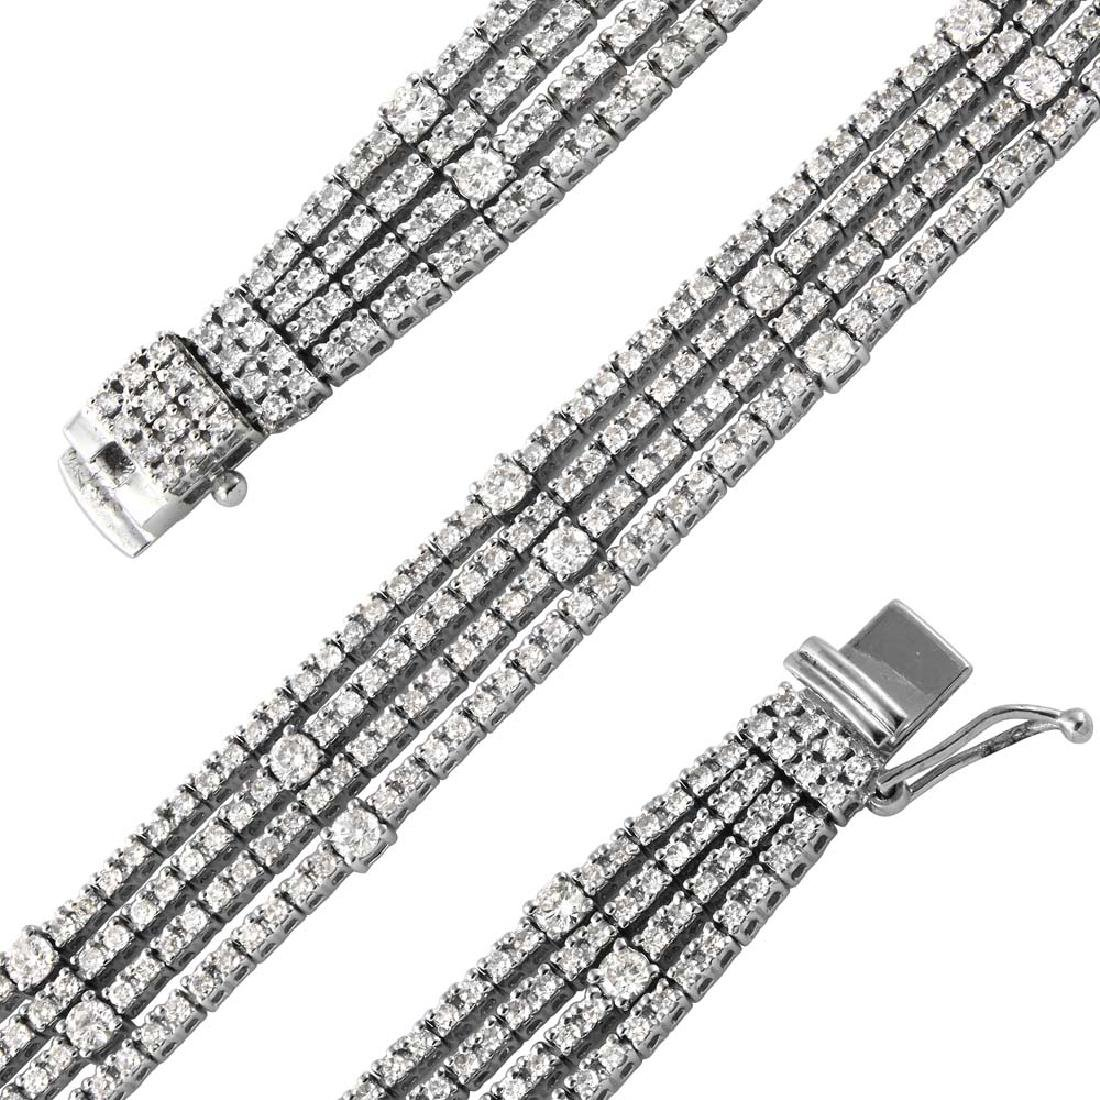 Genuine 4.87 TCW 18K White Gold Ladies Bracelet